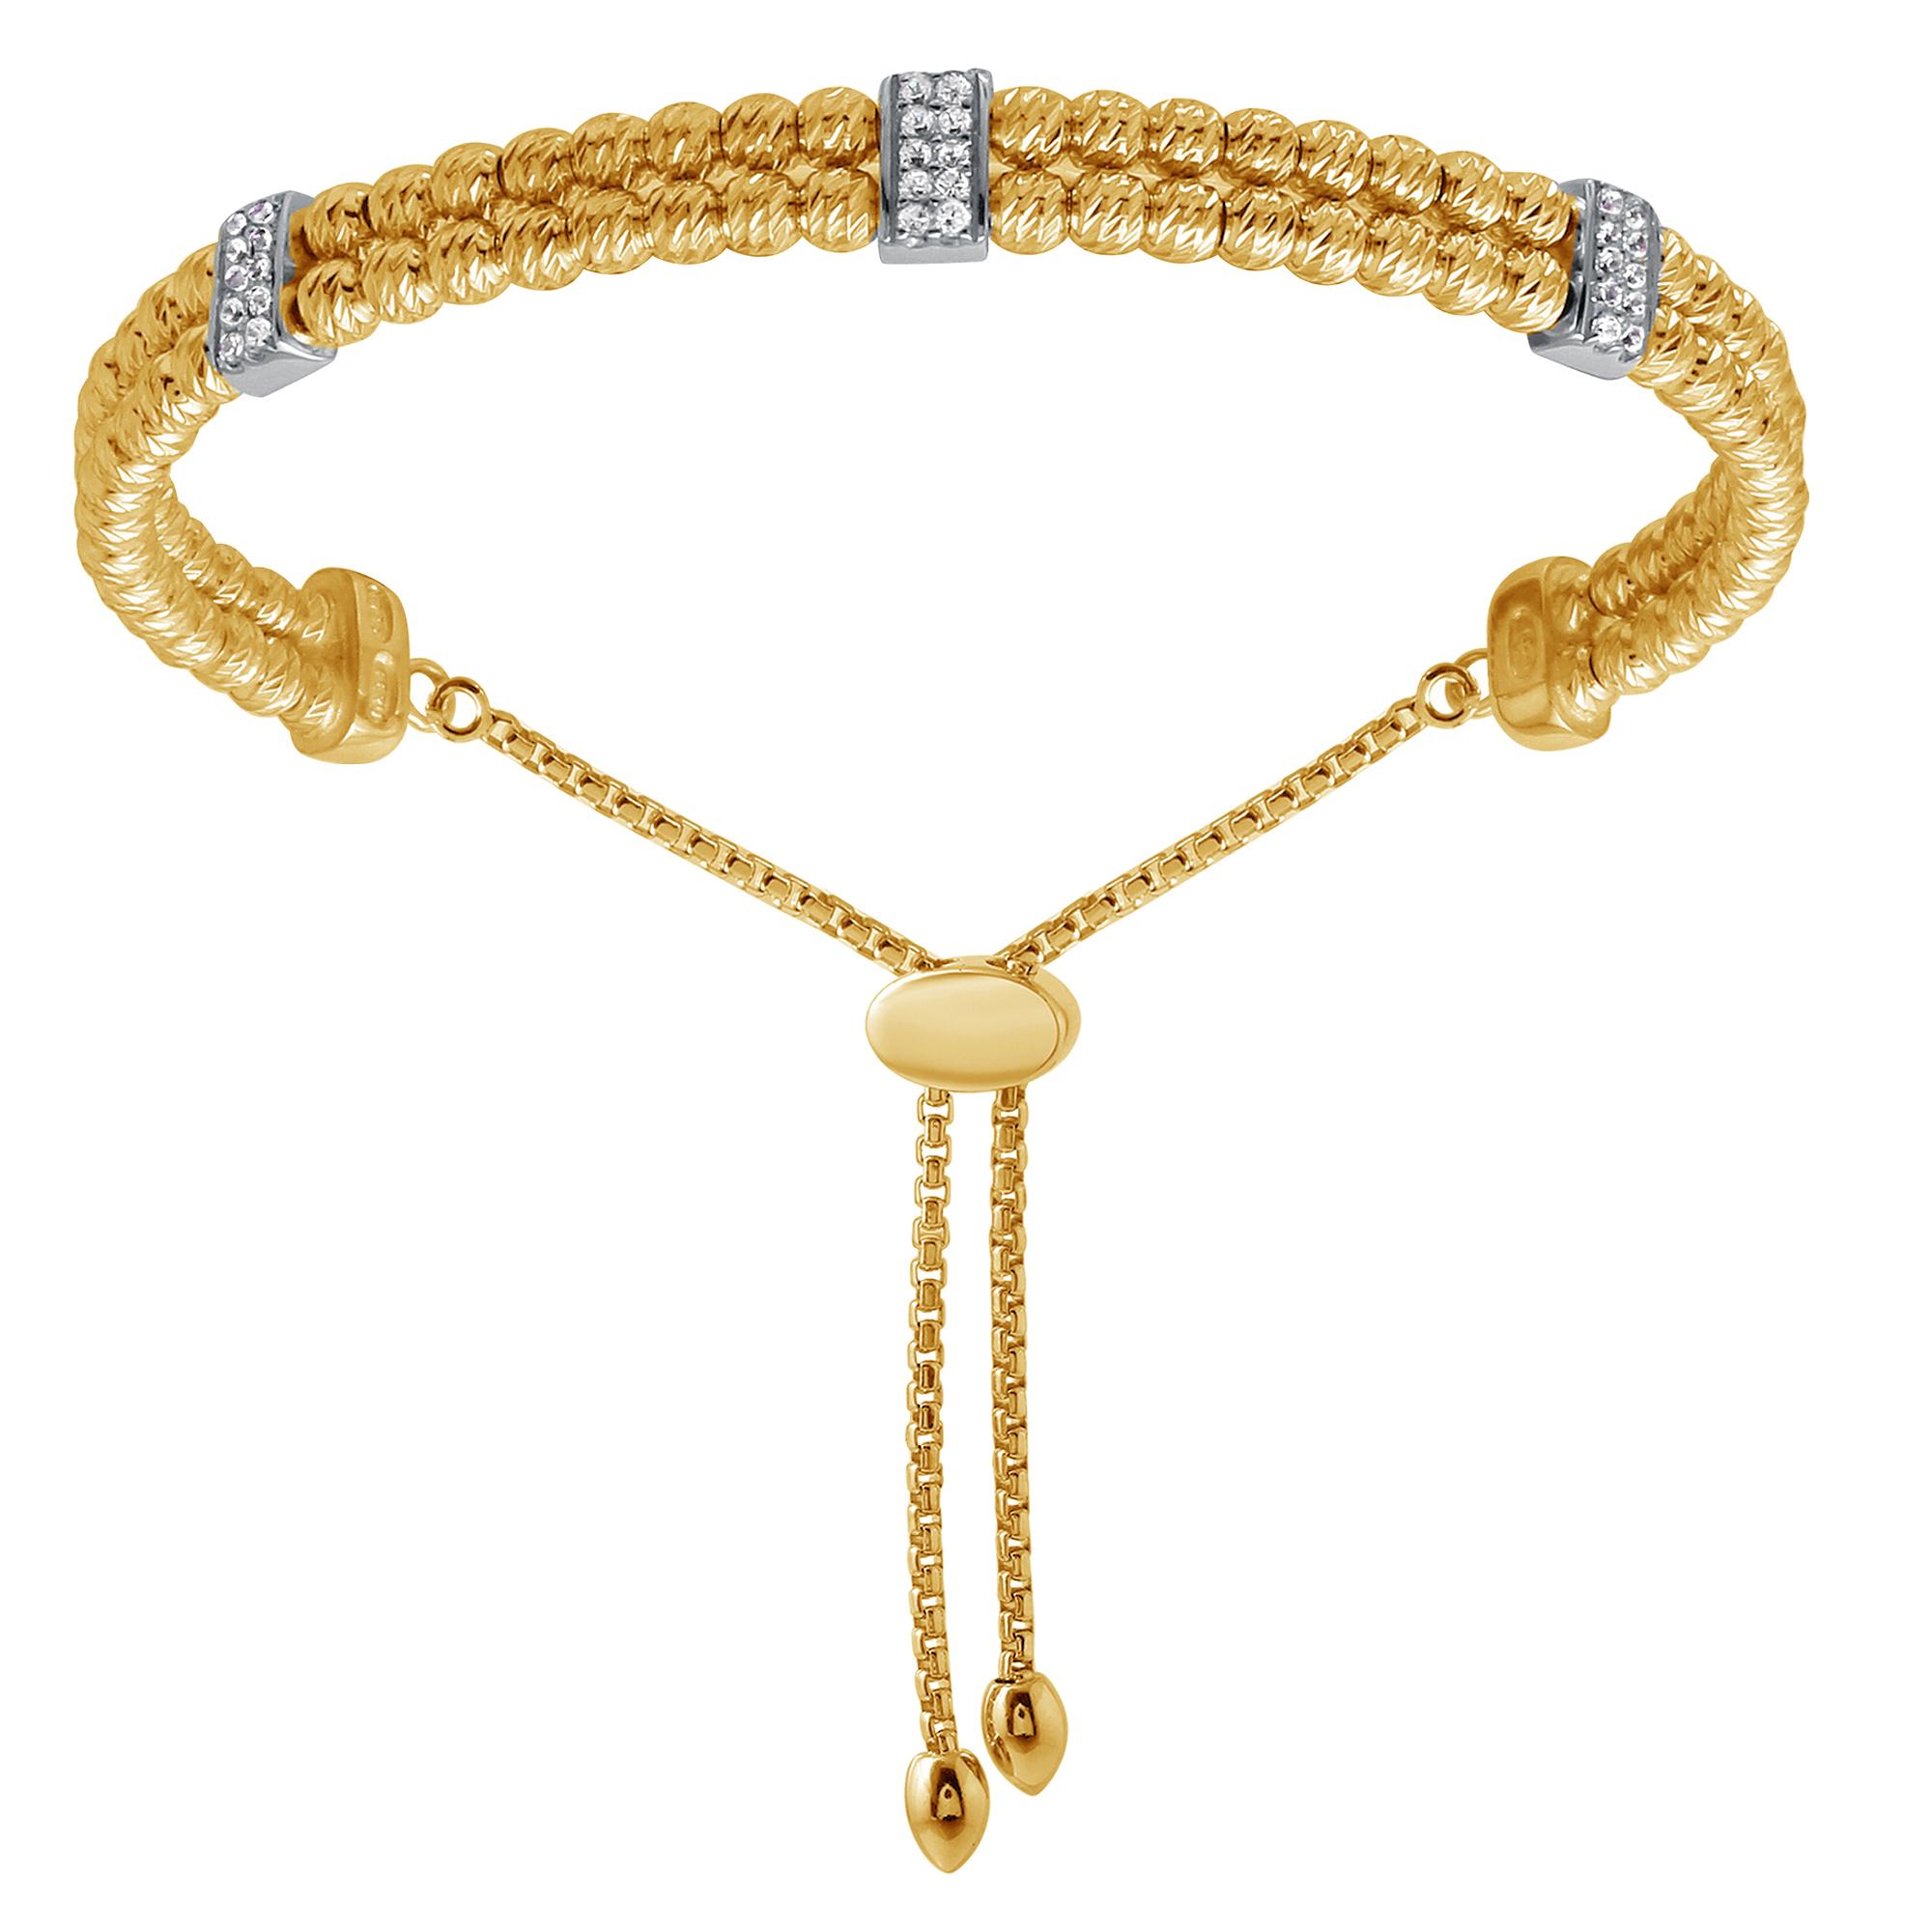 CHARLES GARNIER - Sterling Silver and CZ Bar Bracelet